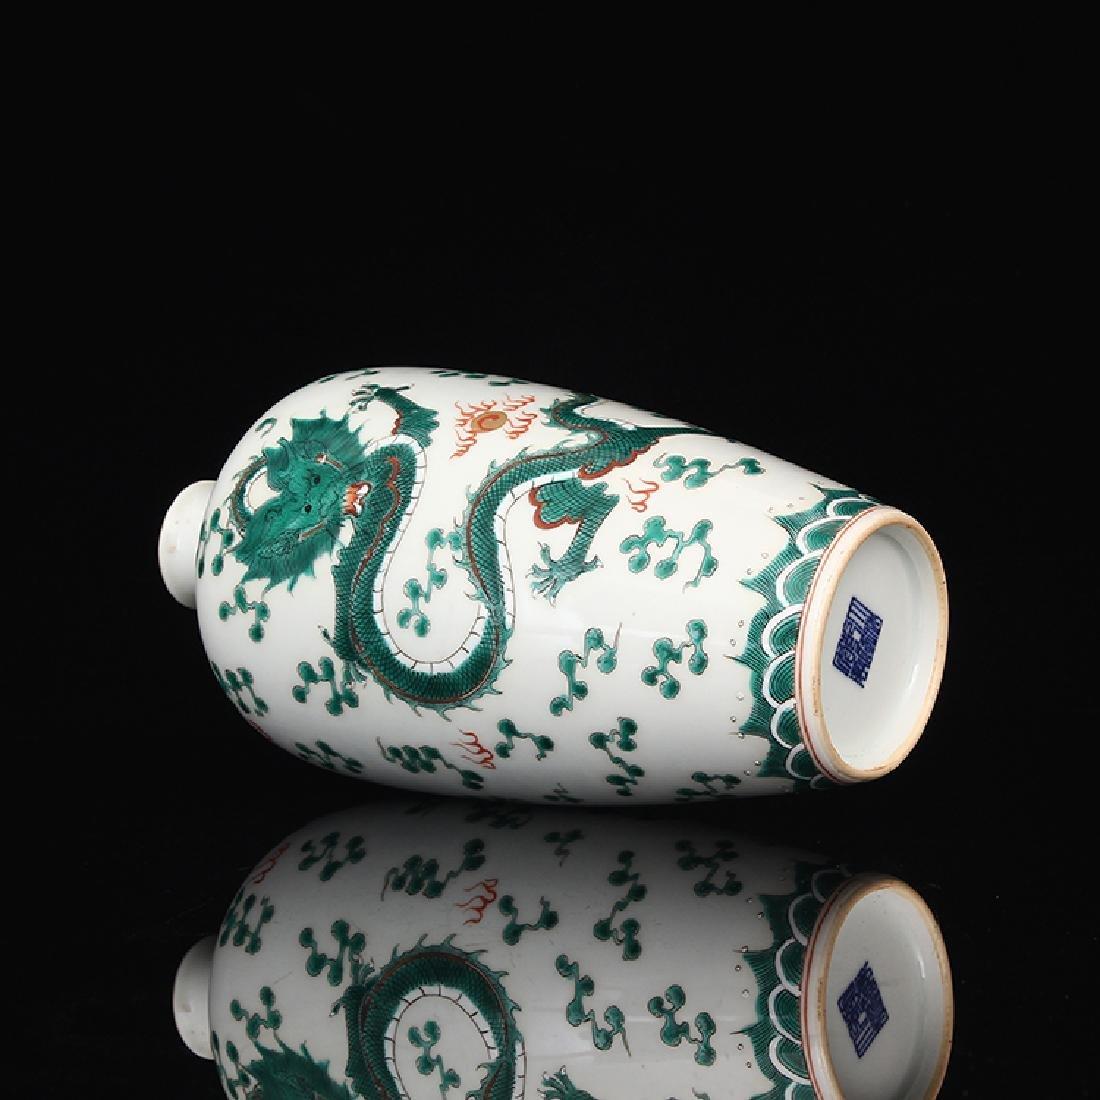 Chinese White Glaze Green Dragon Porcelain  Vase - 5